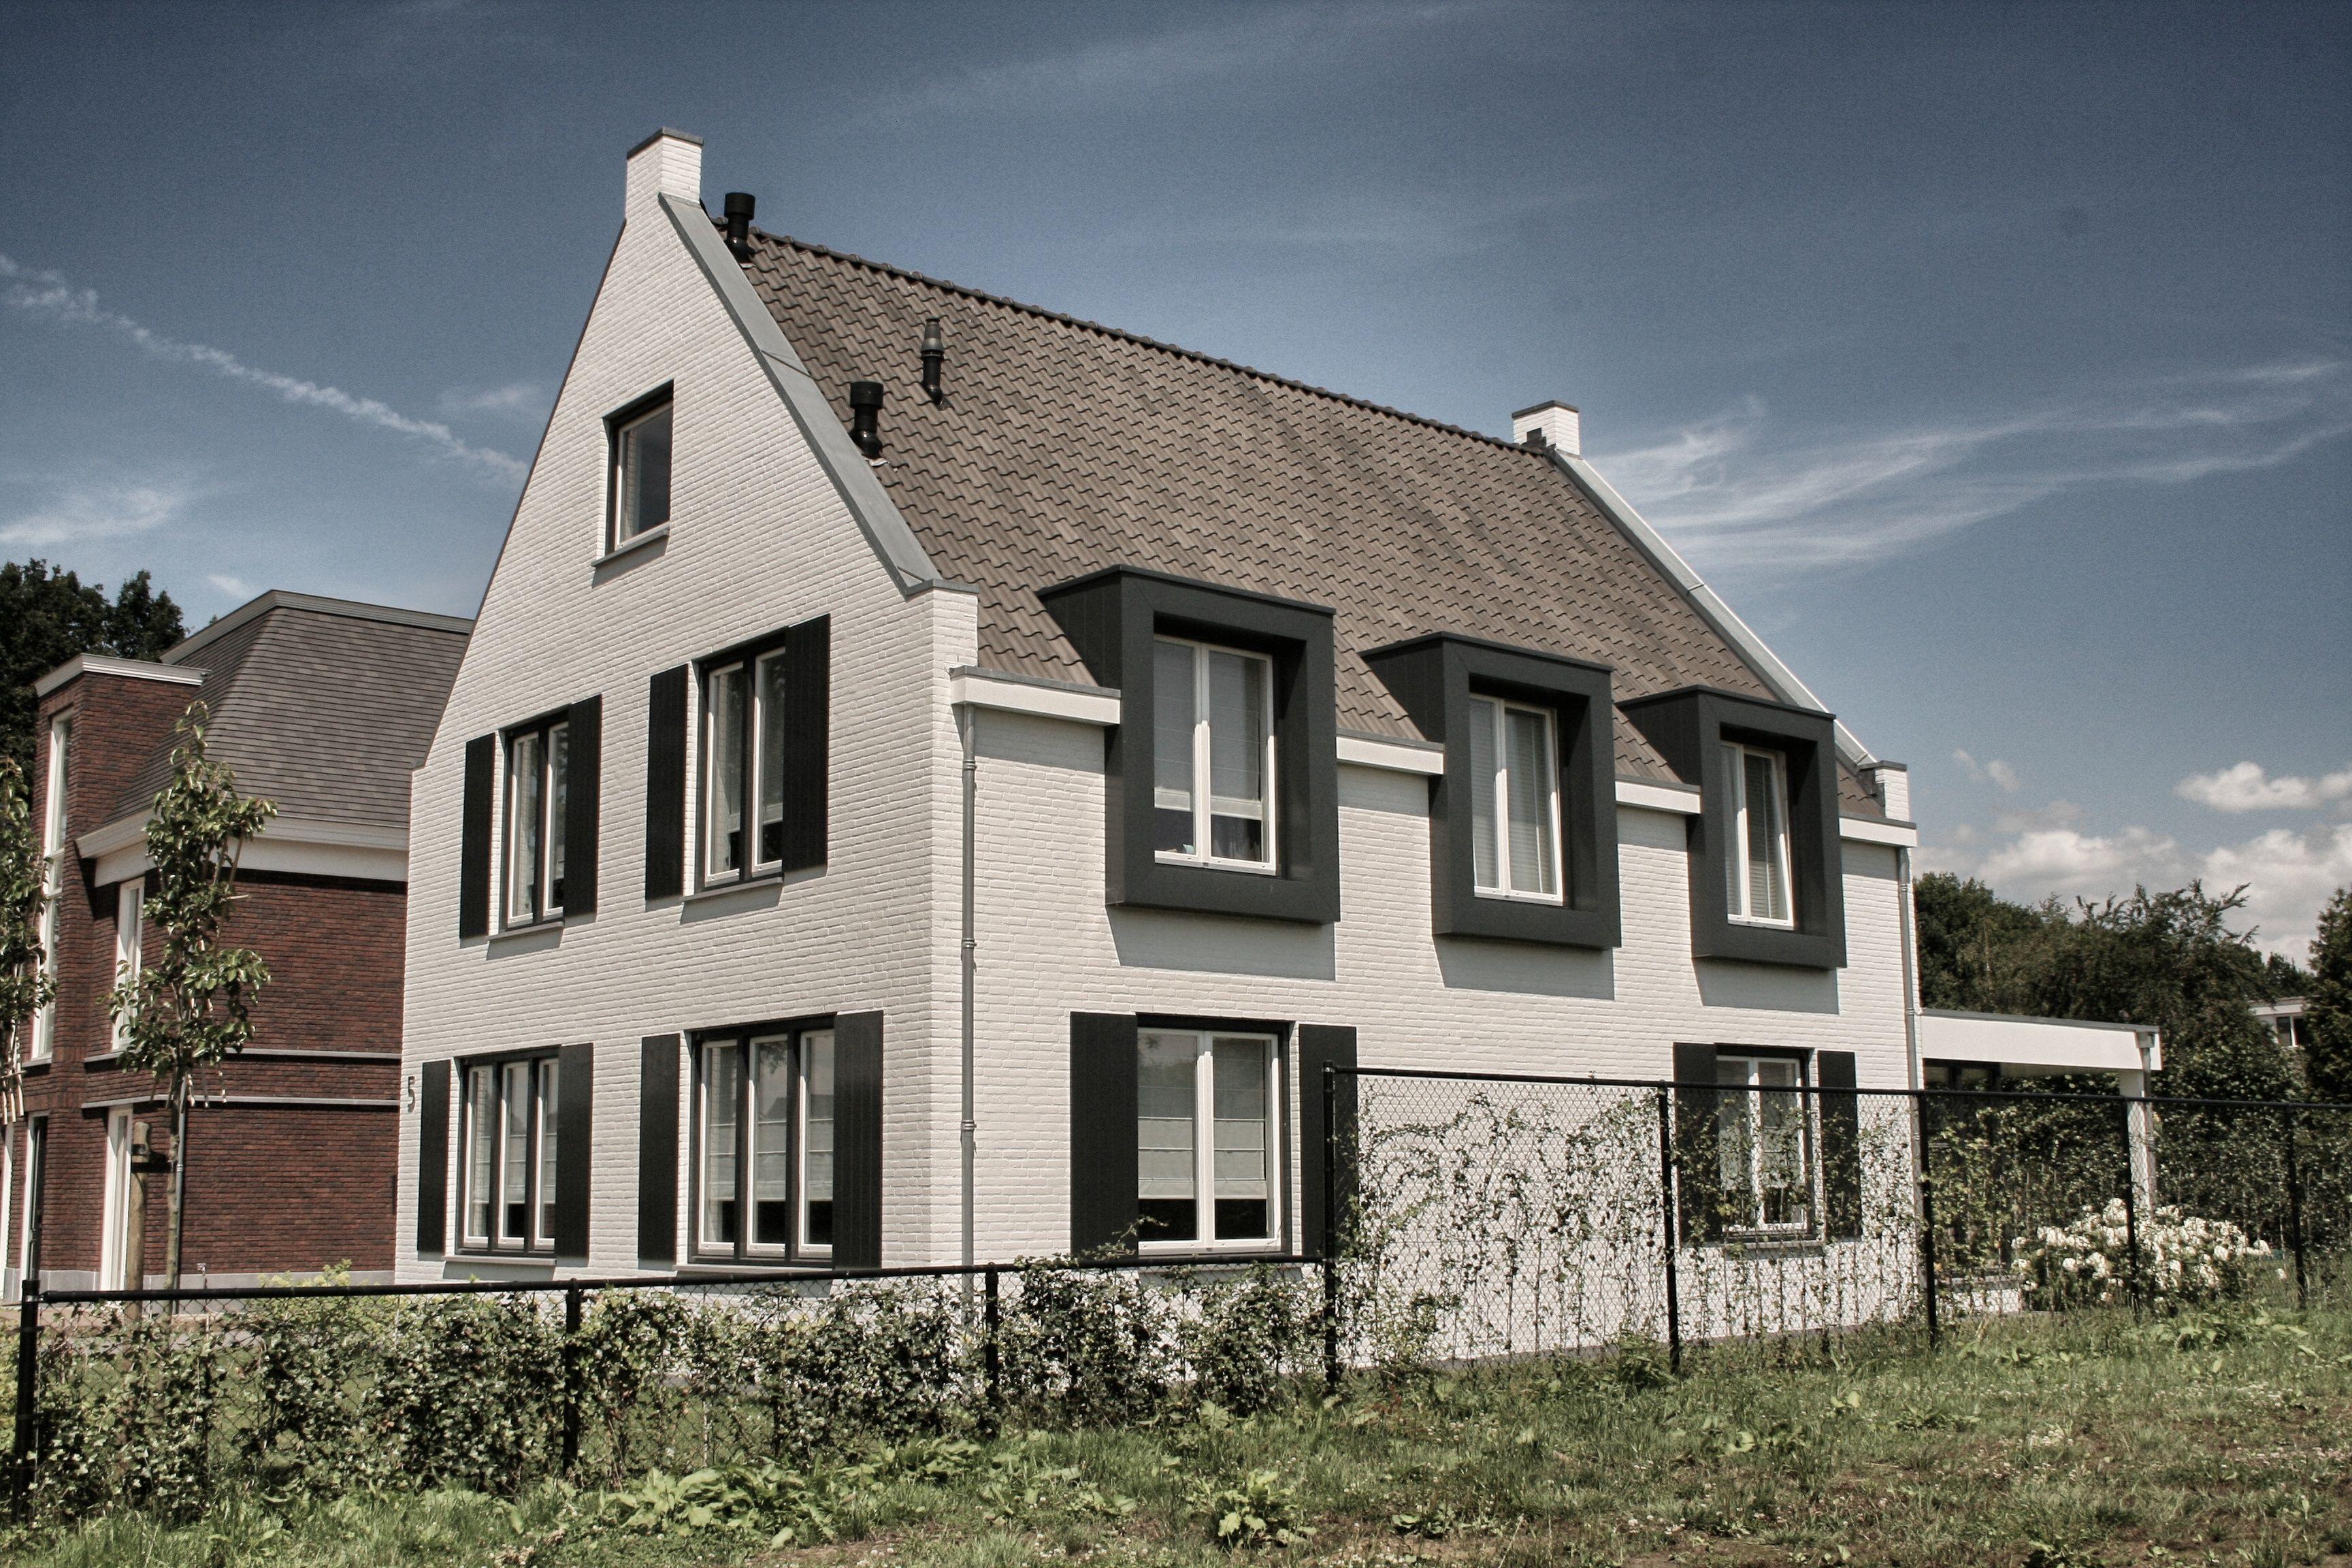 Pin von Ilya Nikitin auf 1-3 houses   Pinterest   Architektur ...